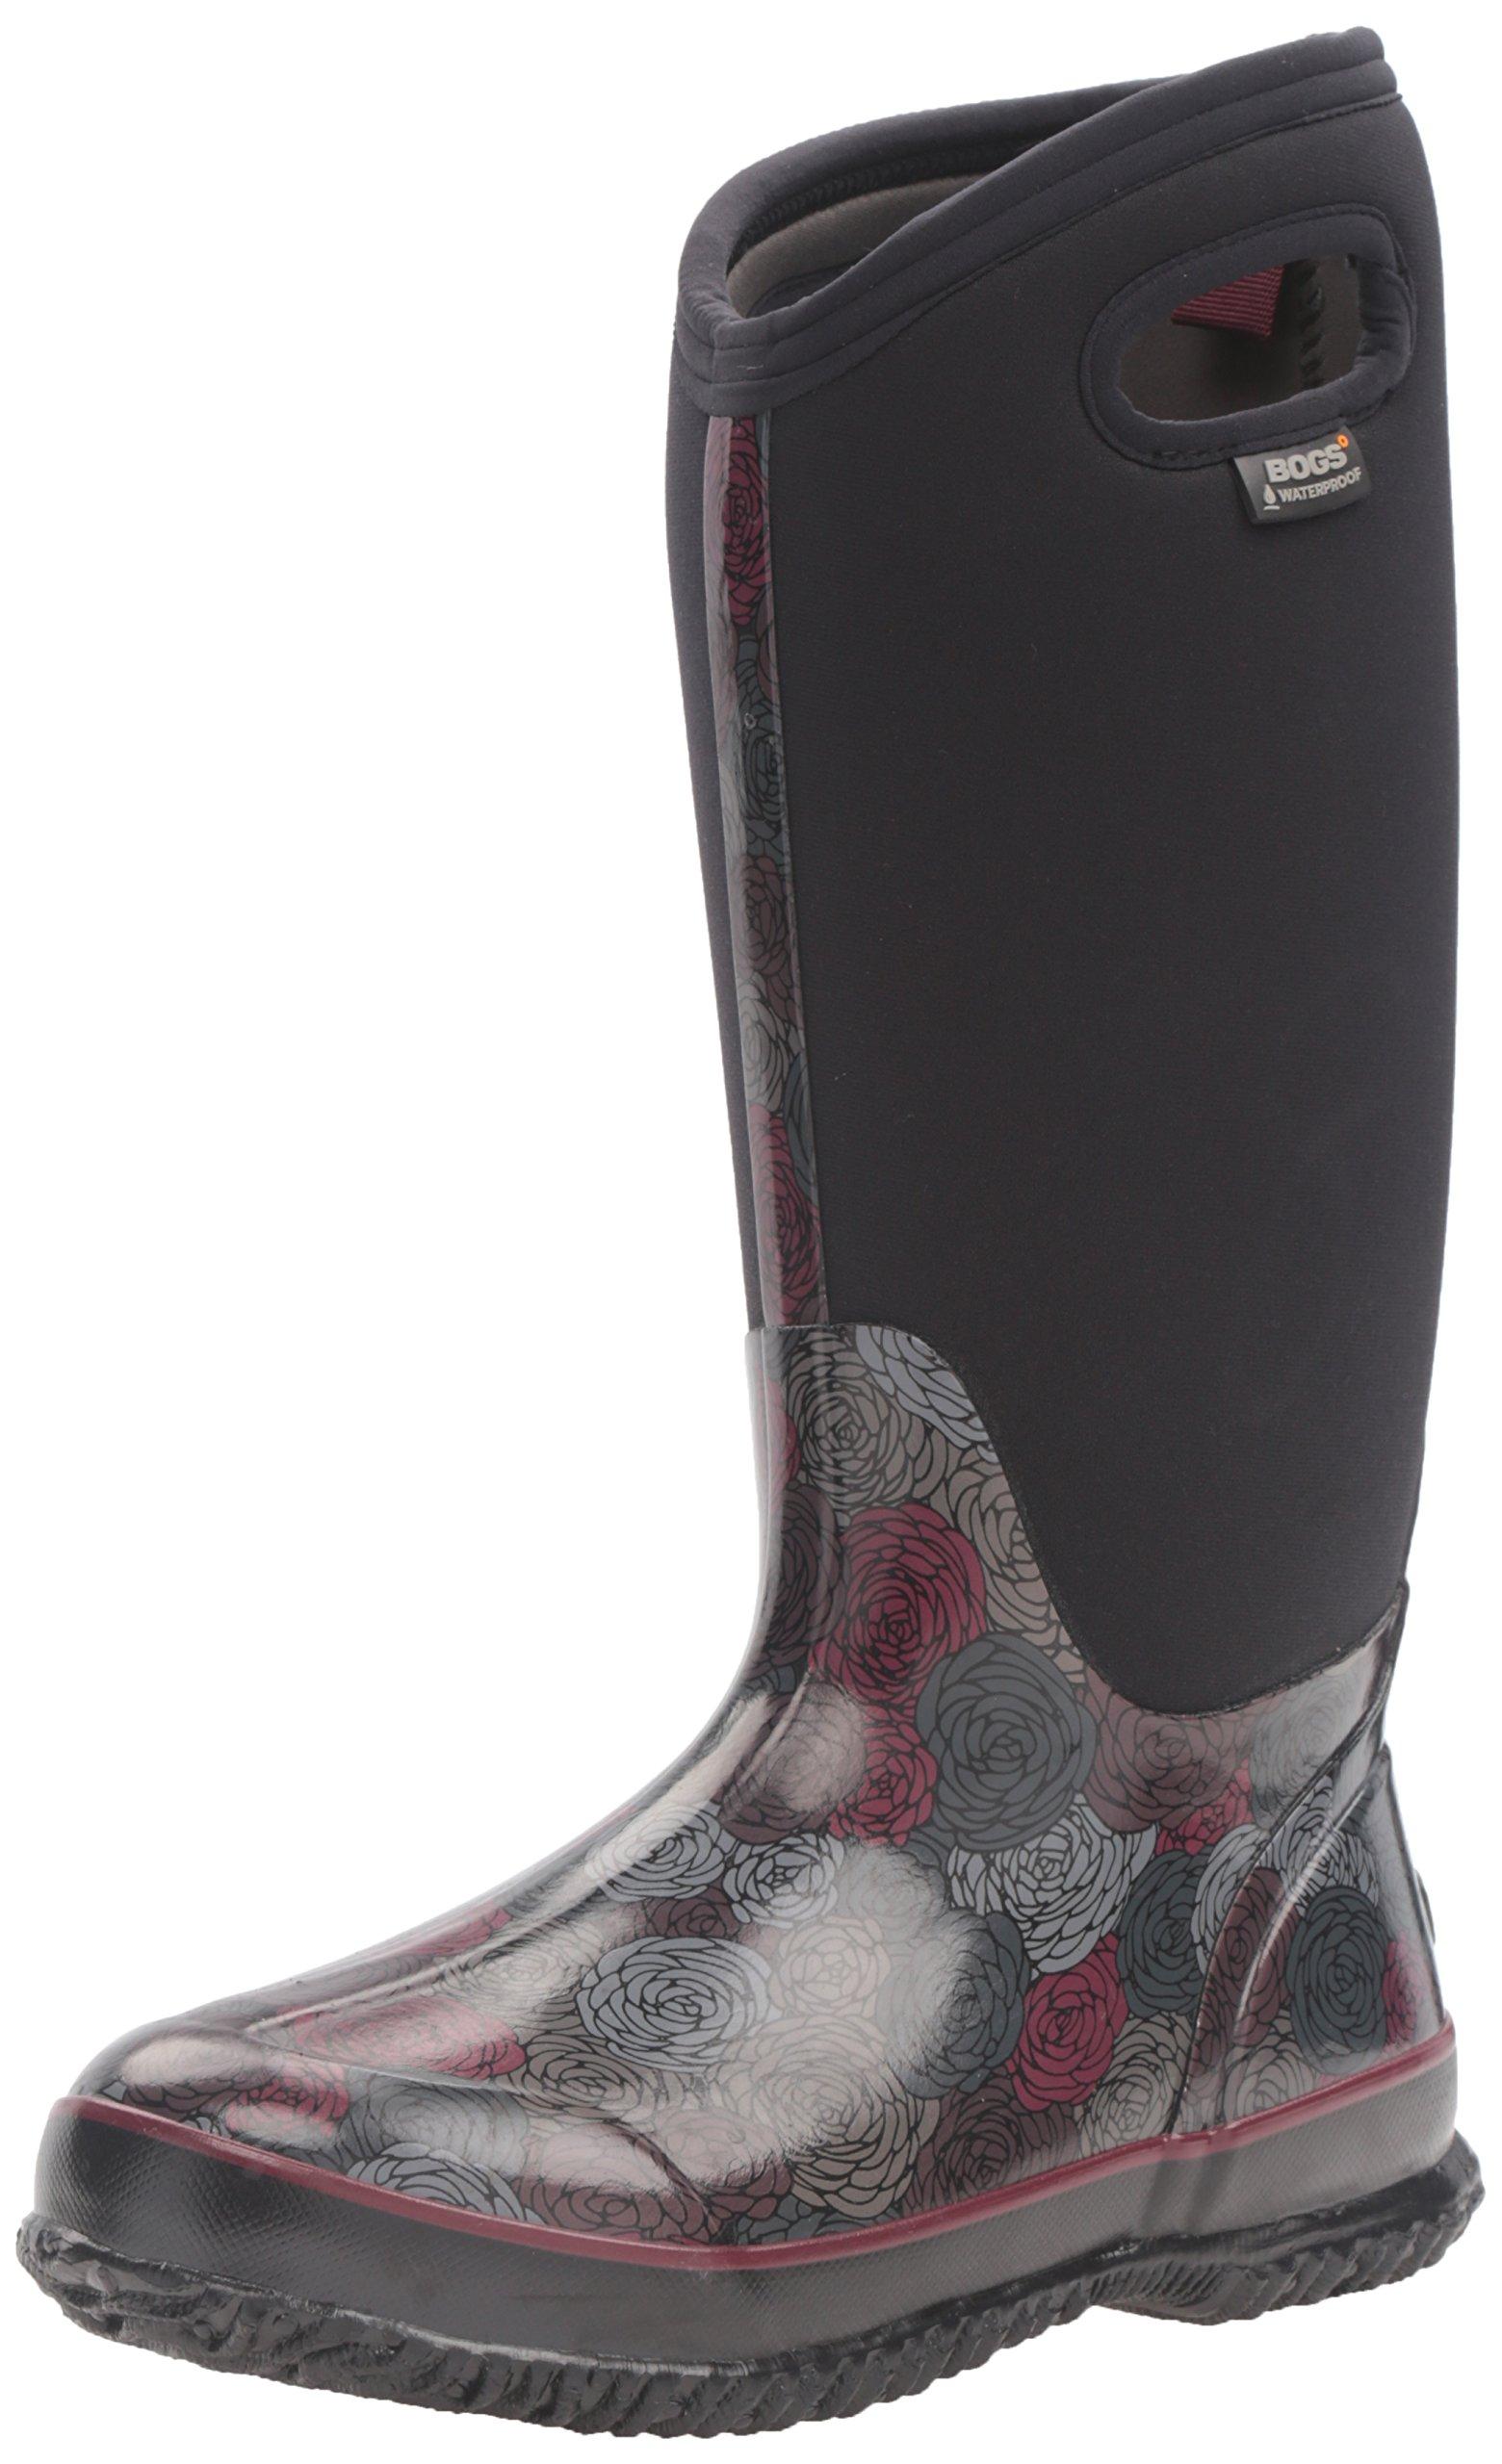 Bogs Women's Classic Rosey Tall Snow Boot, Black/Multi, 6 M US